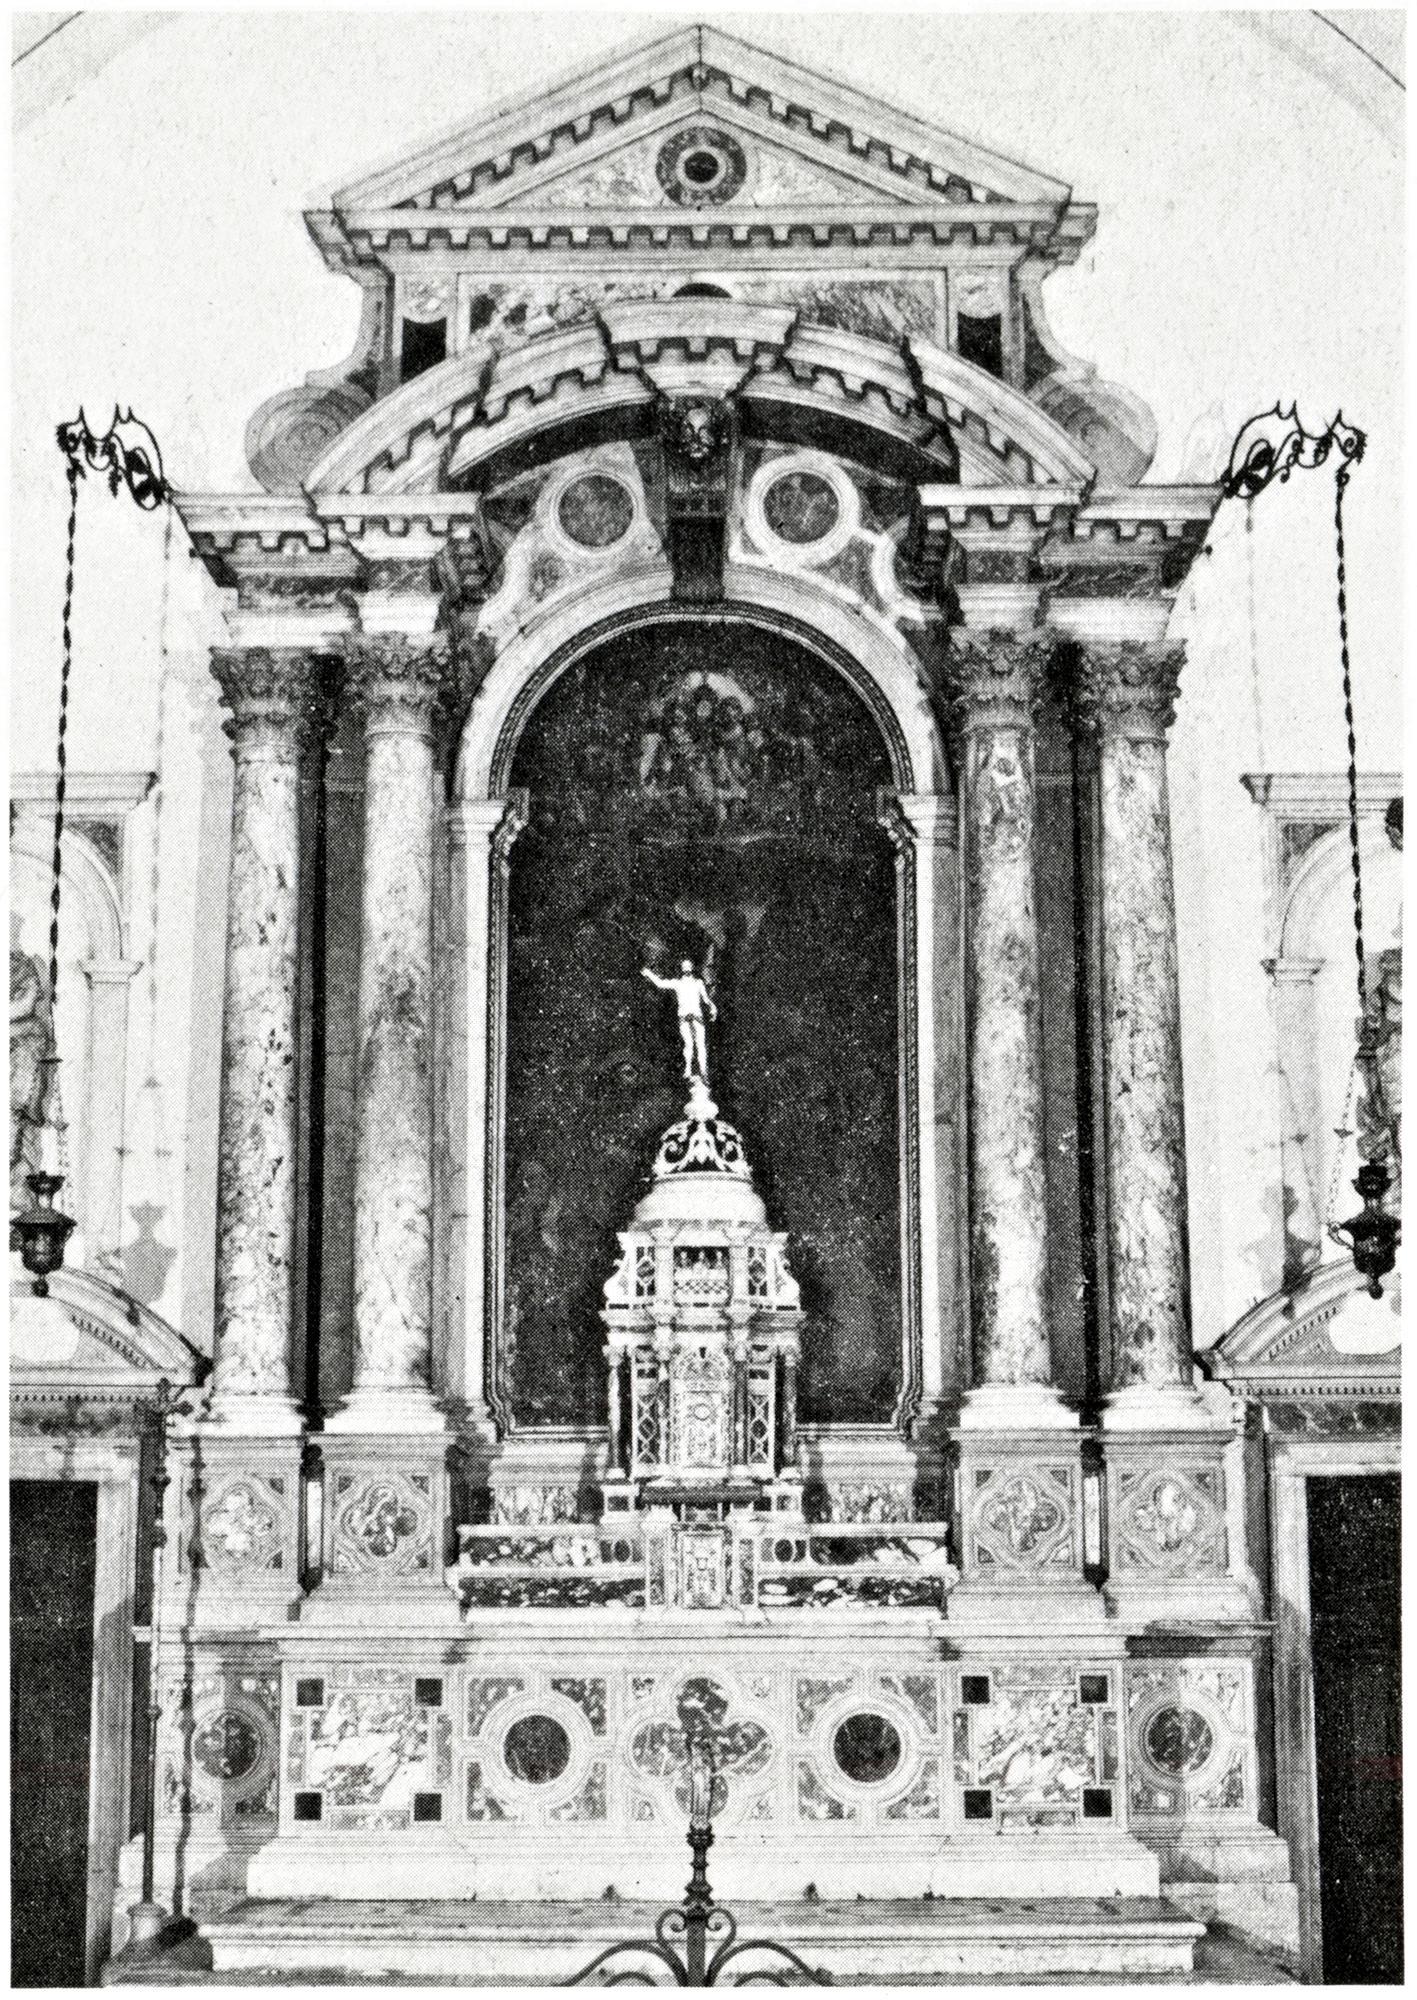 Altare di S. Giacomo apostolo, vecchia chiesa di San Giacomo, Battaglia Terme.